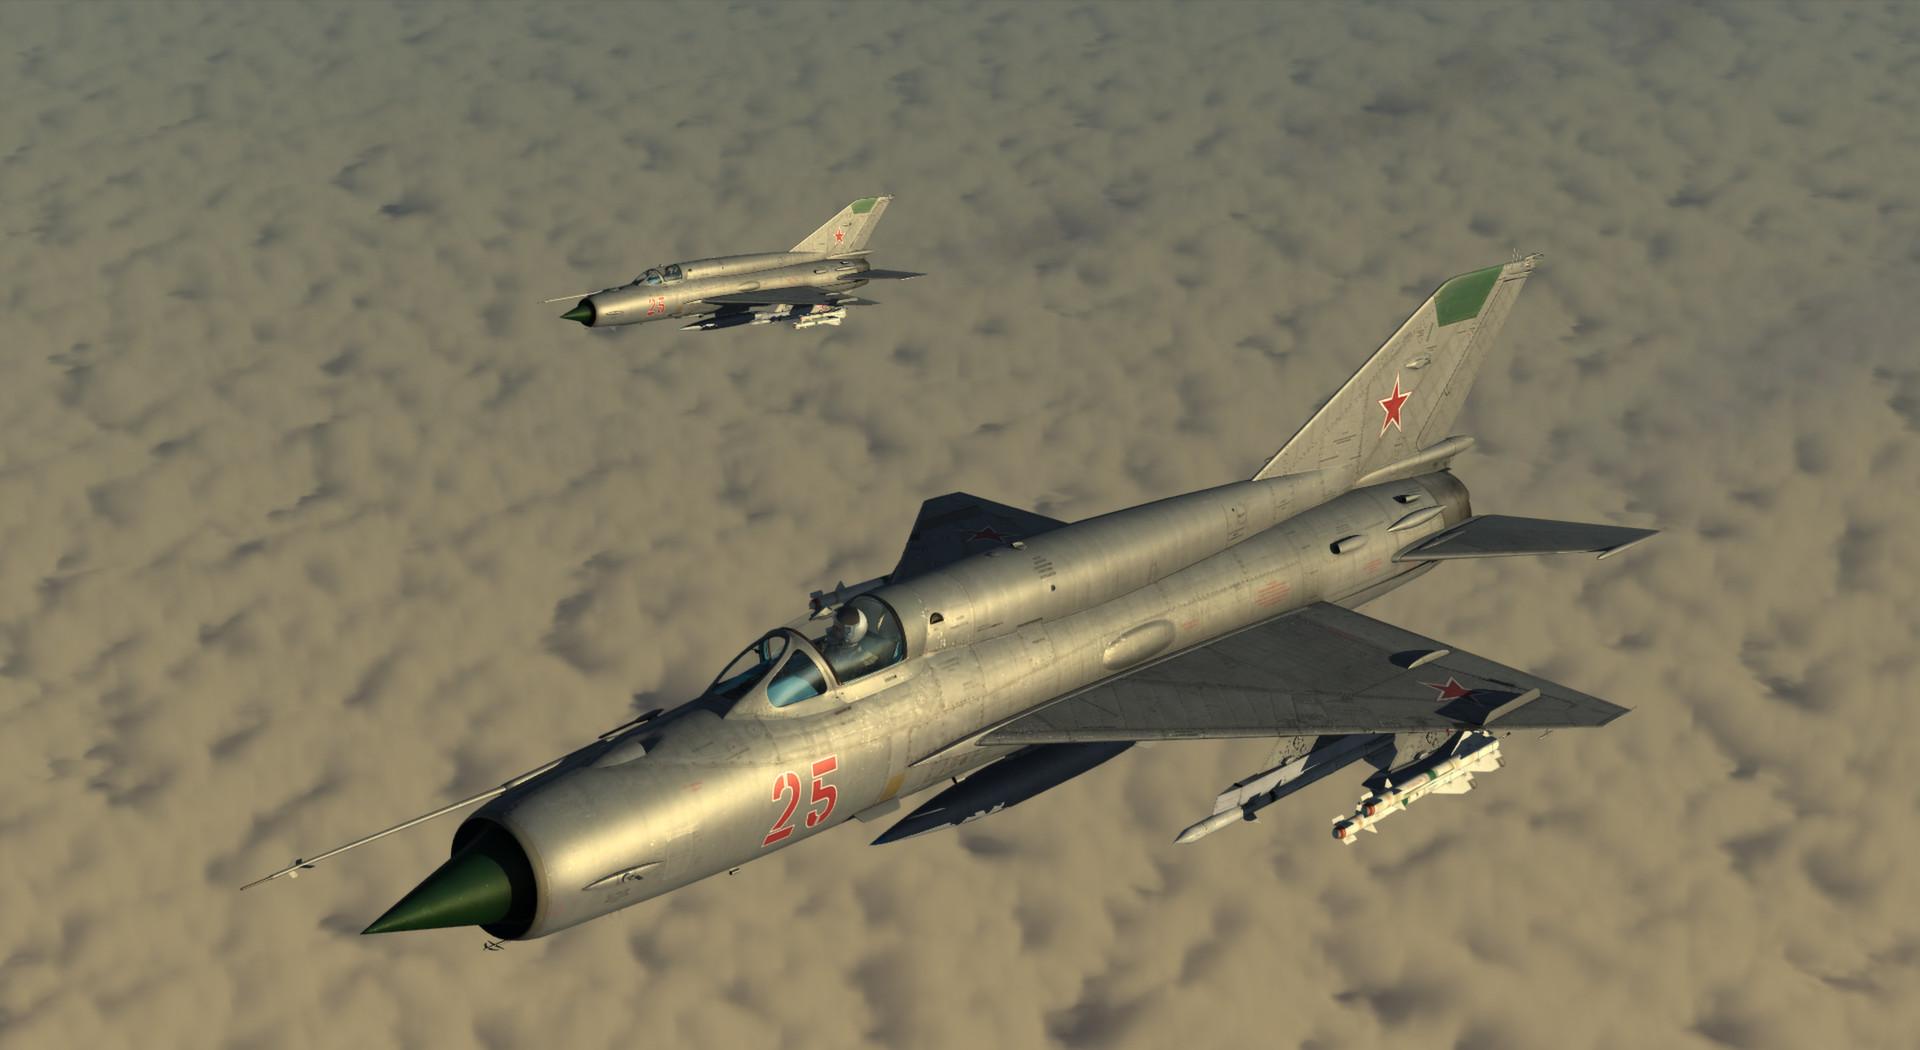 DCS: MiG-21Bis Fiyat Karşılaştırma